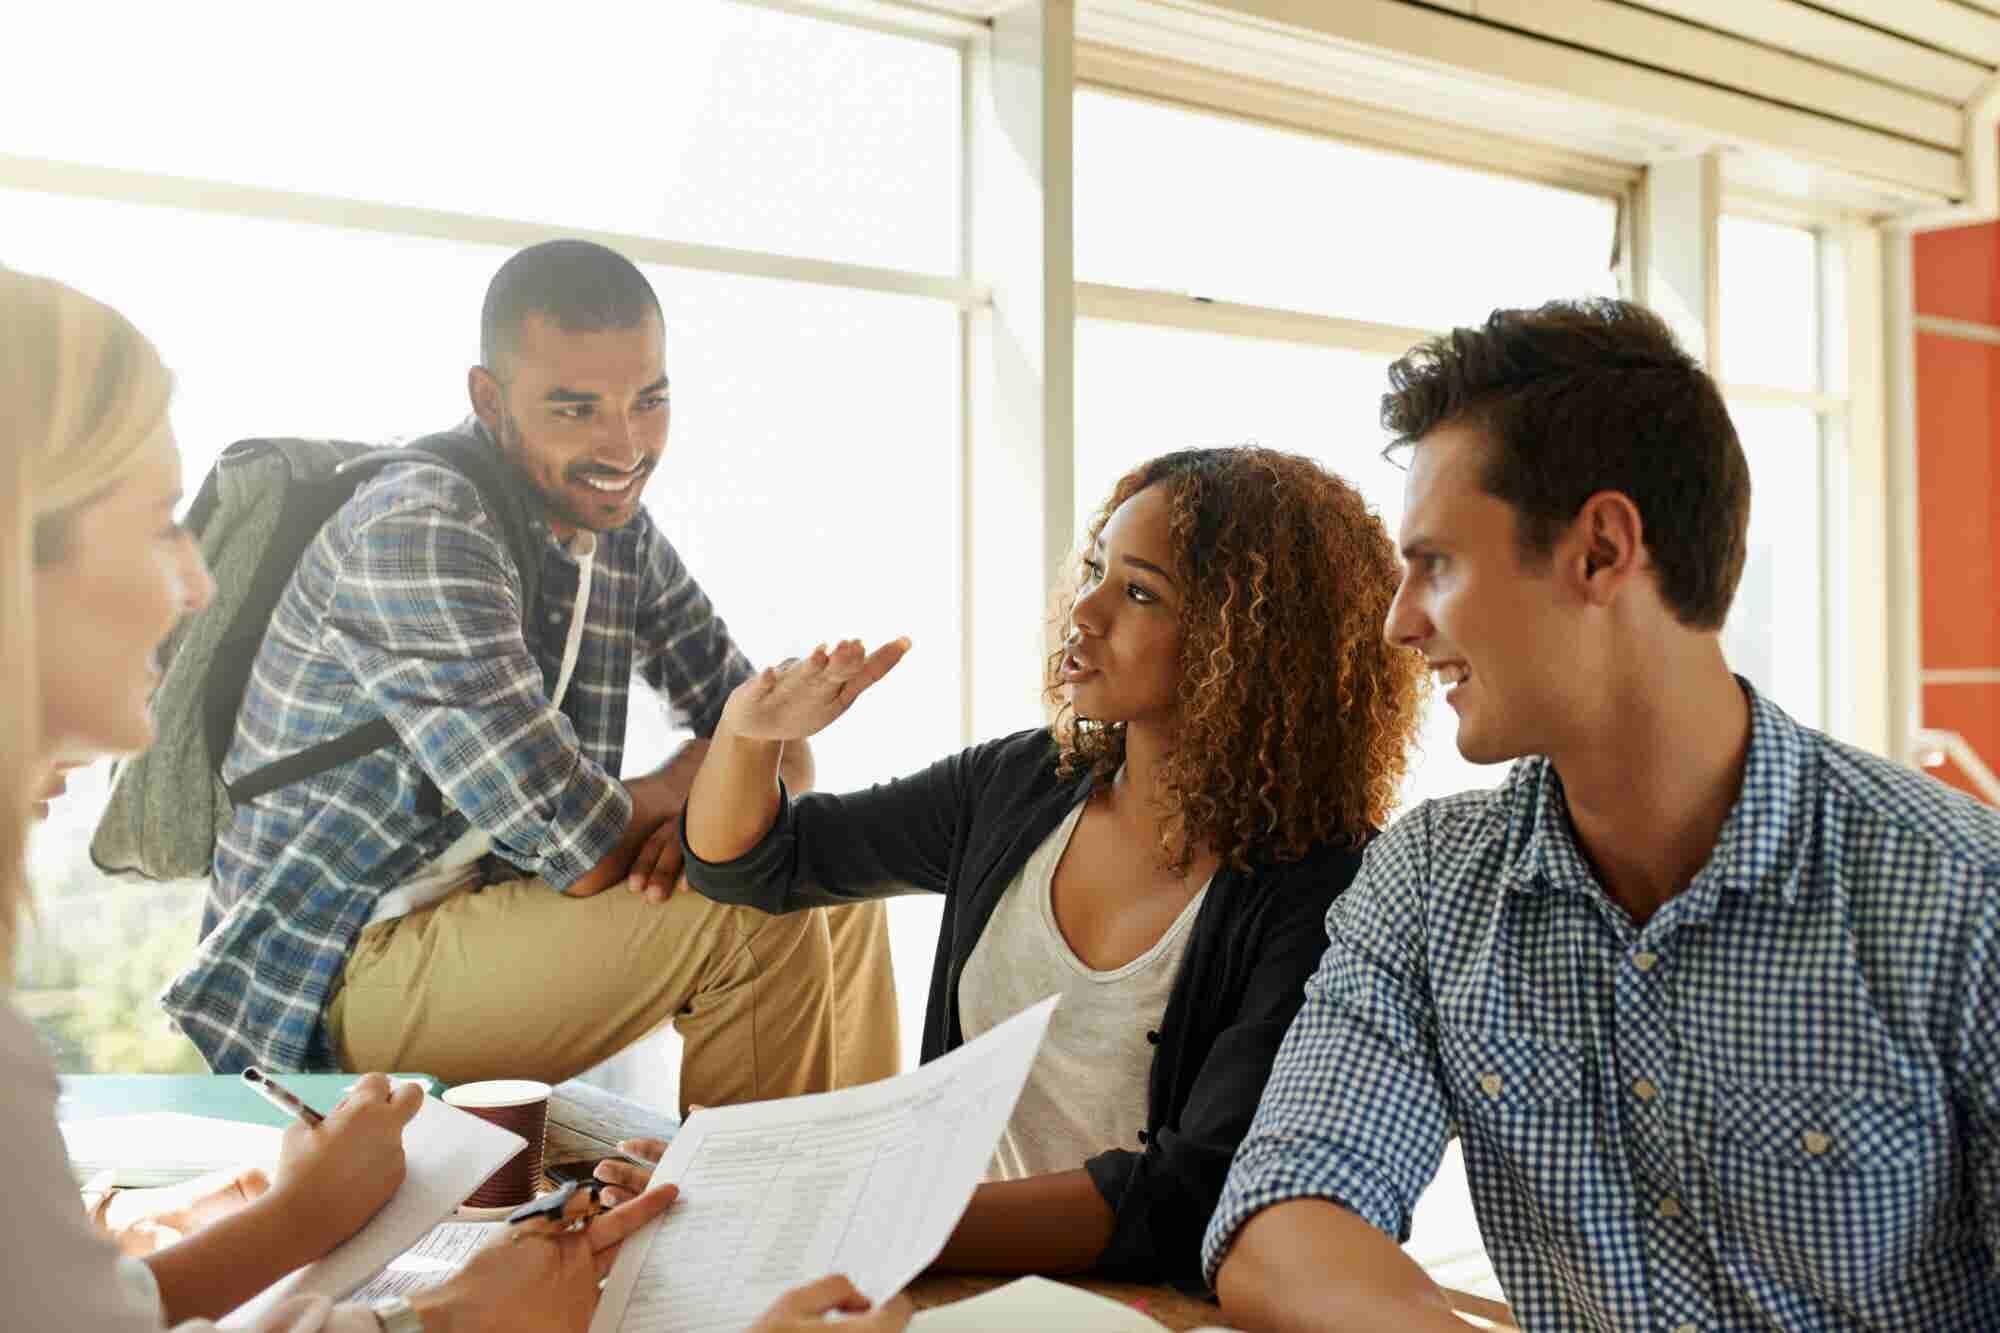 Top 25 Best Undergrad Programs for Entrepreneurs in 2019